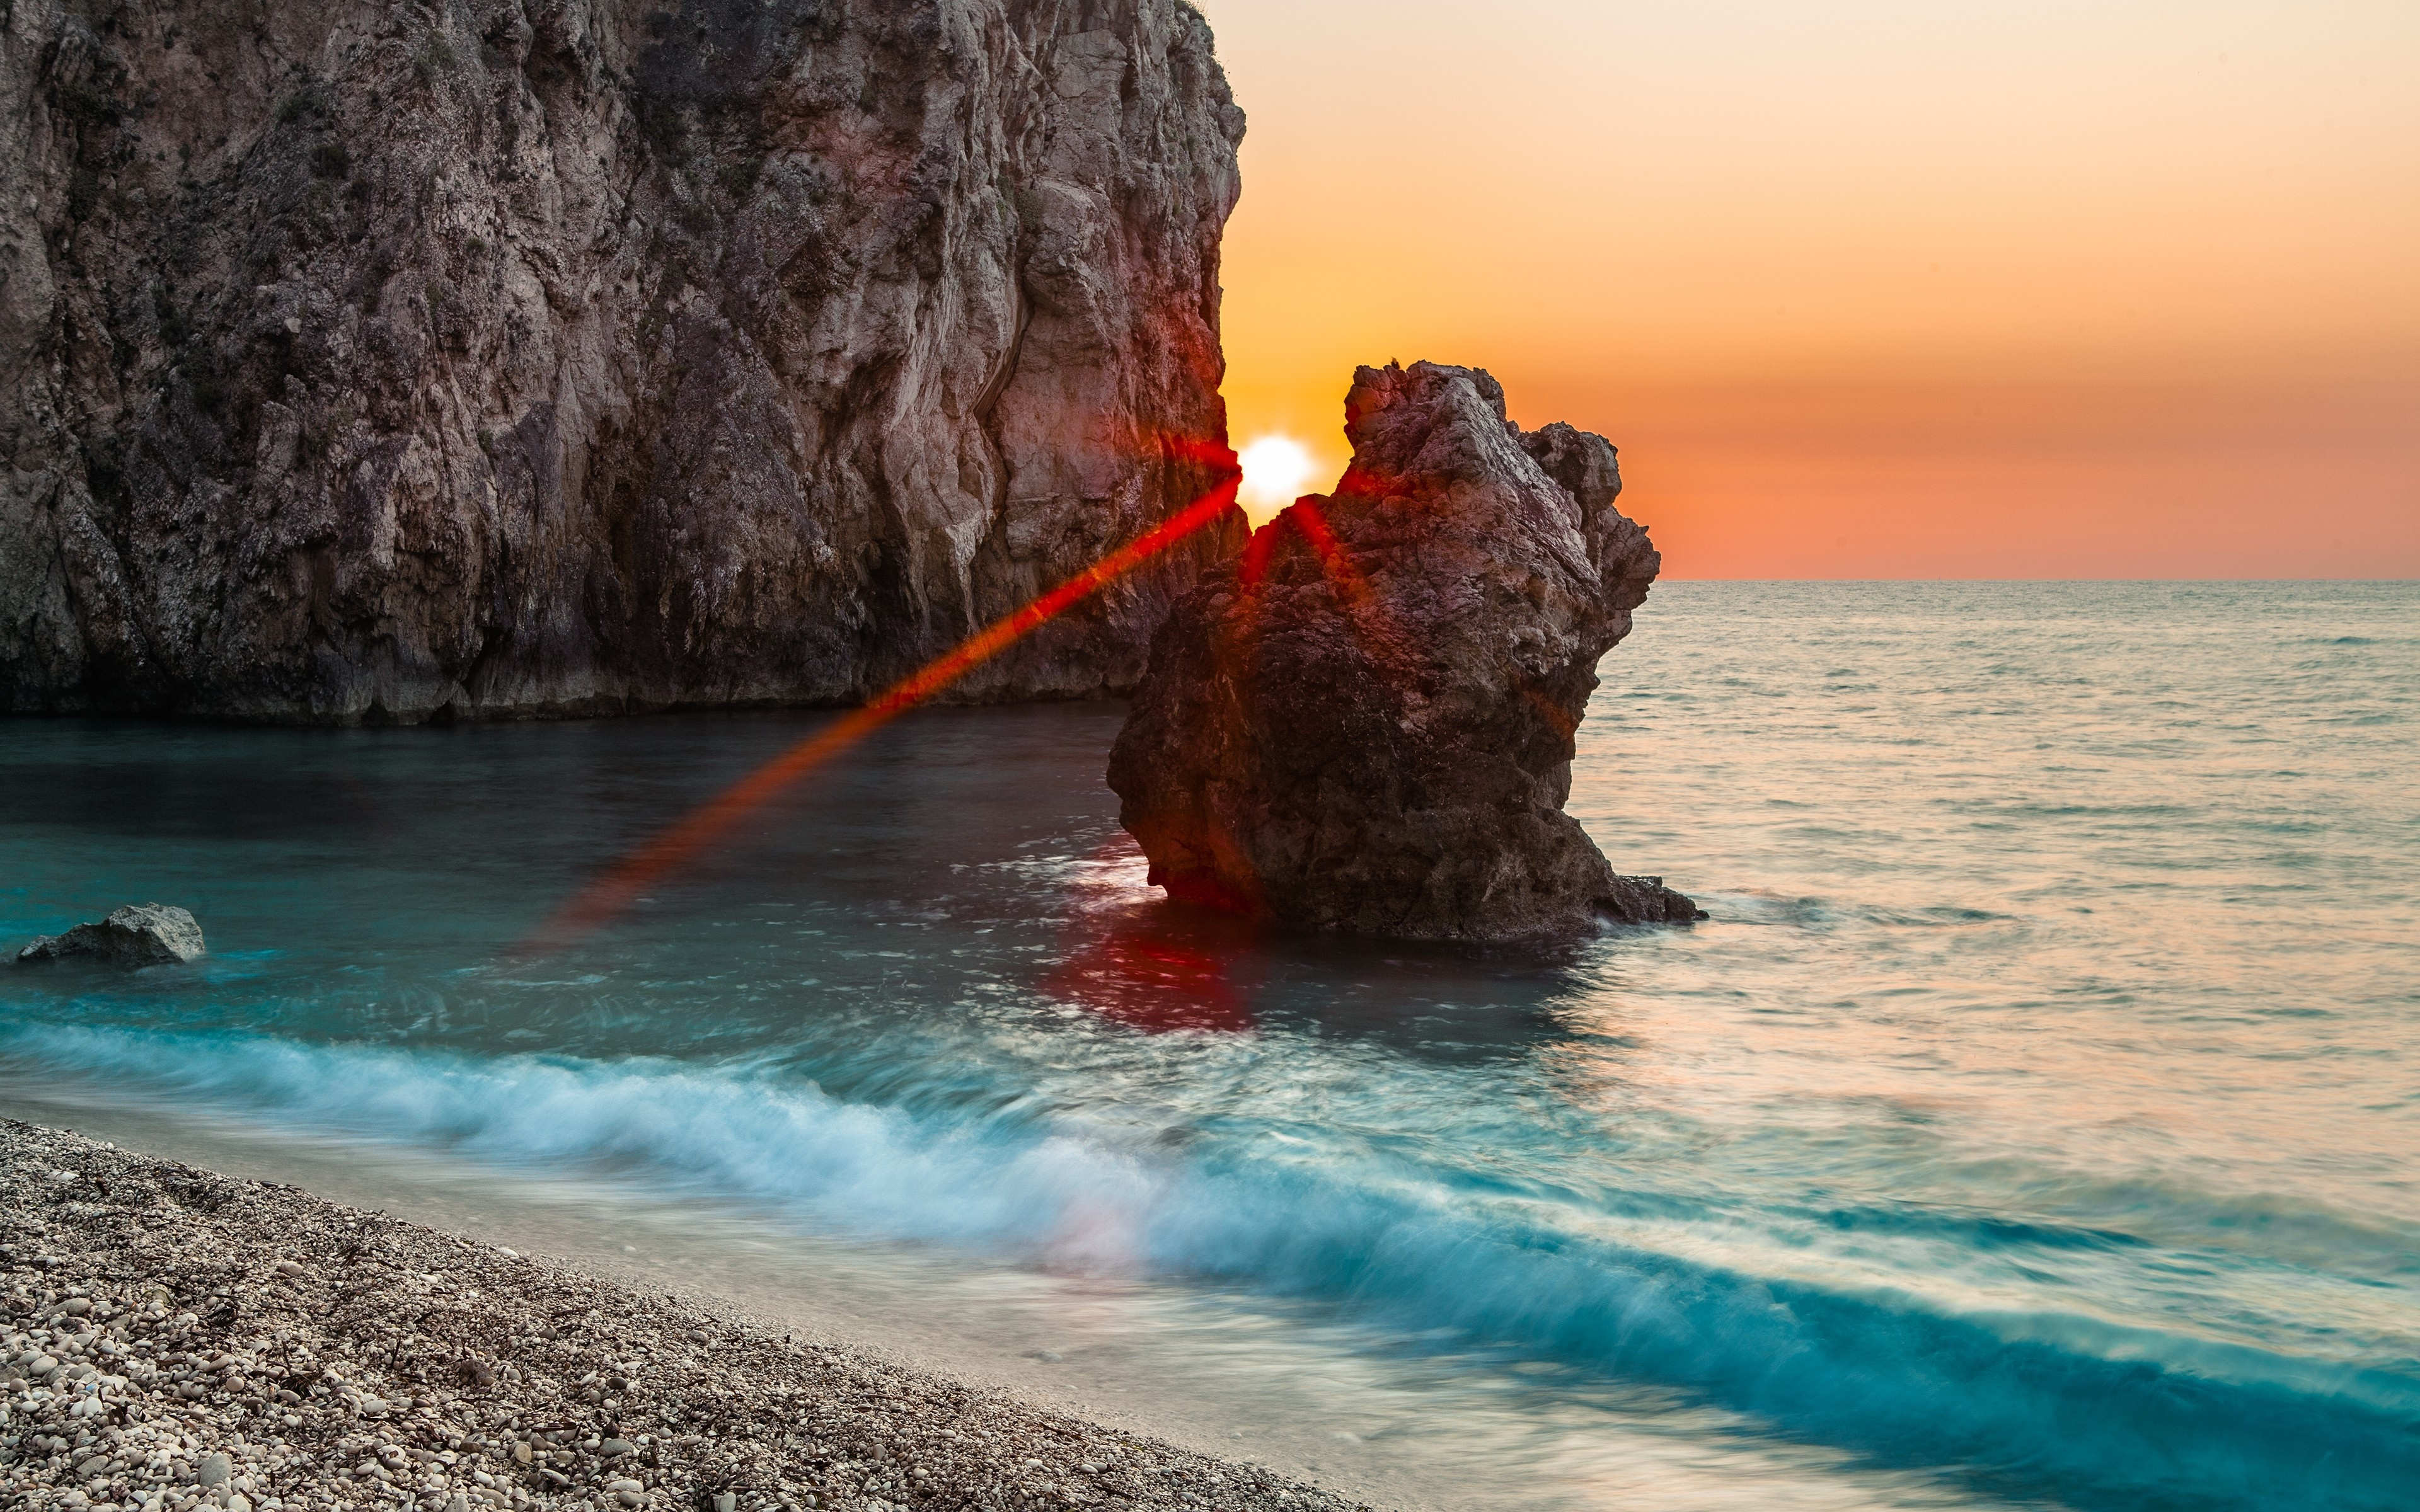 Скалы берег море солнце  № 2719575 загрузить